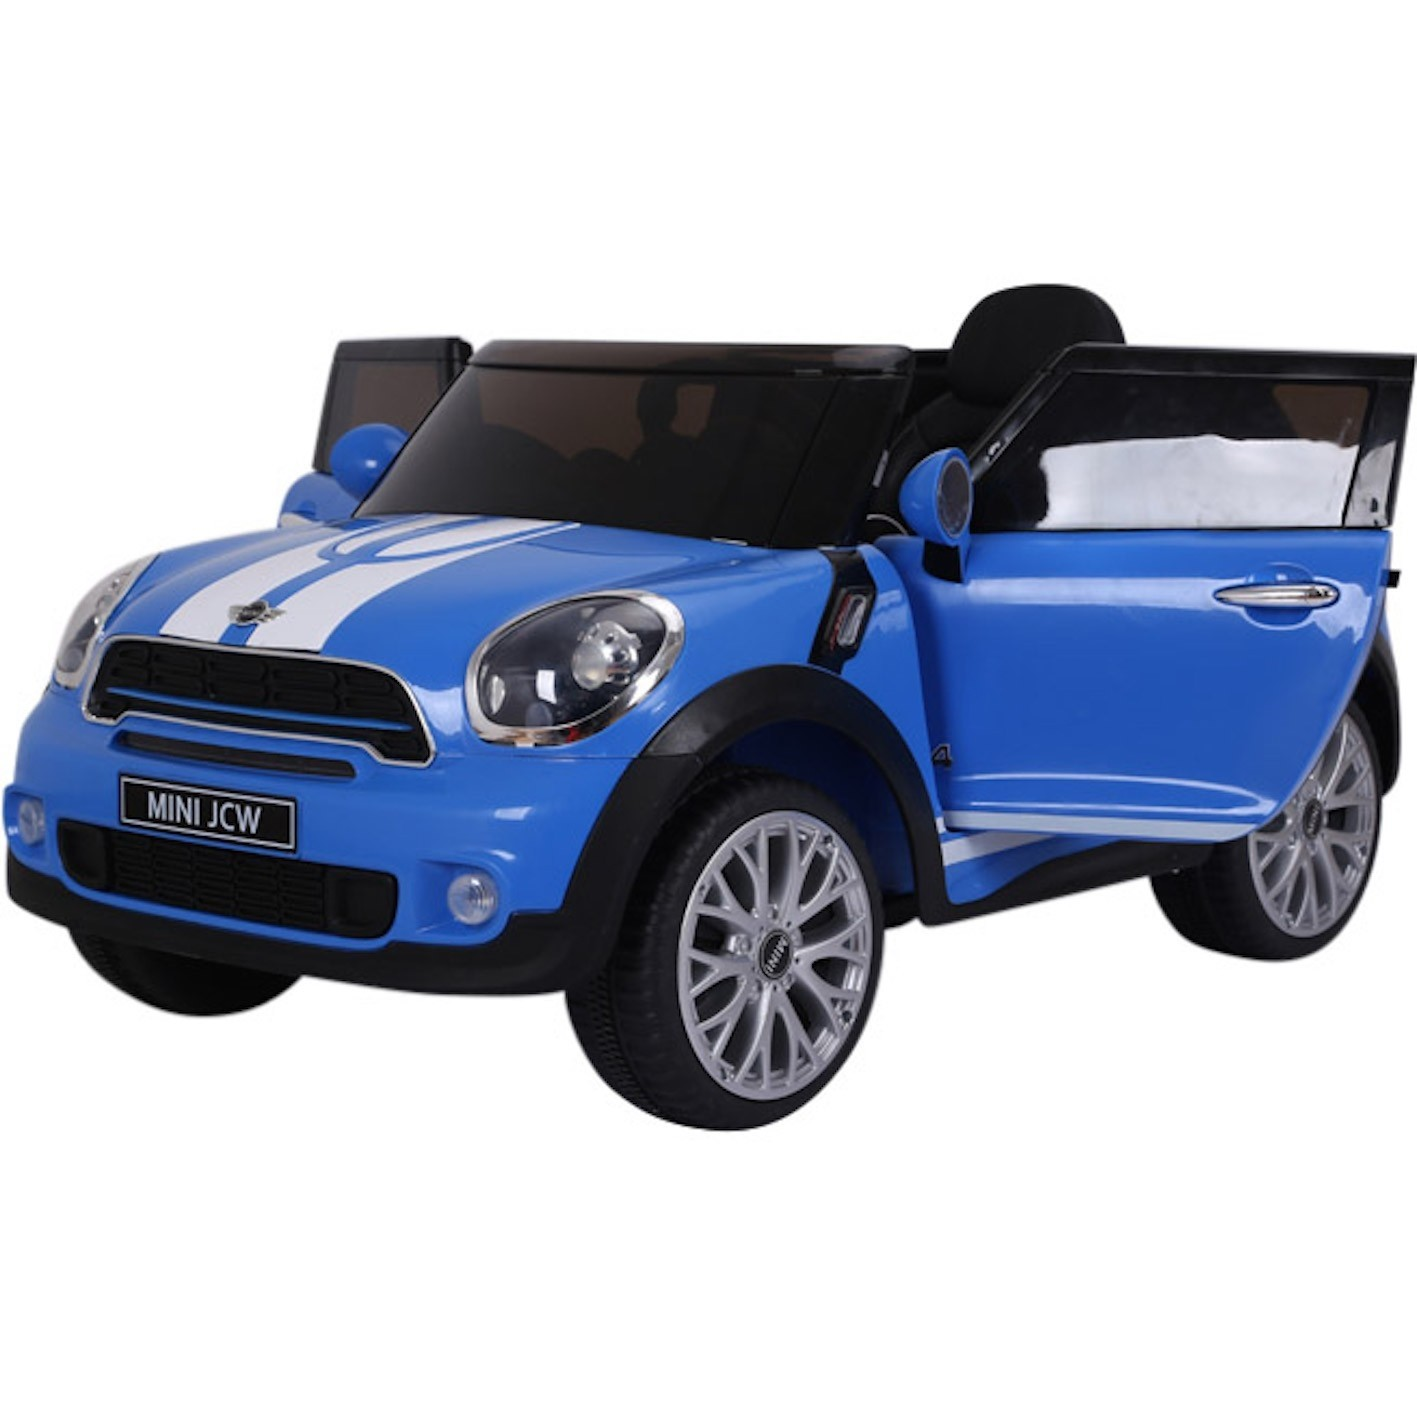 Mini Cooper Paceman Licensed 12V Children's Ride-On Toy Car - Blue